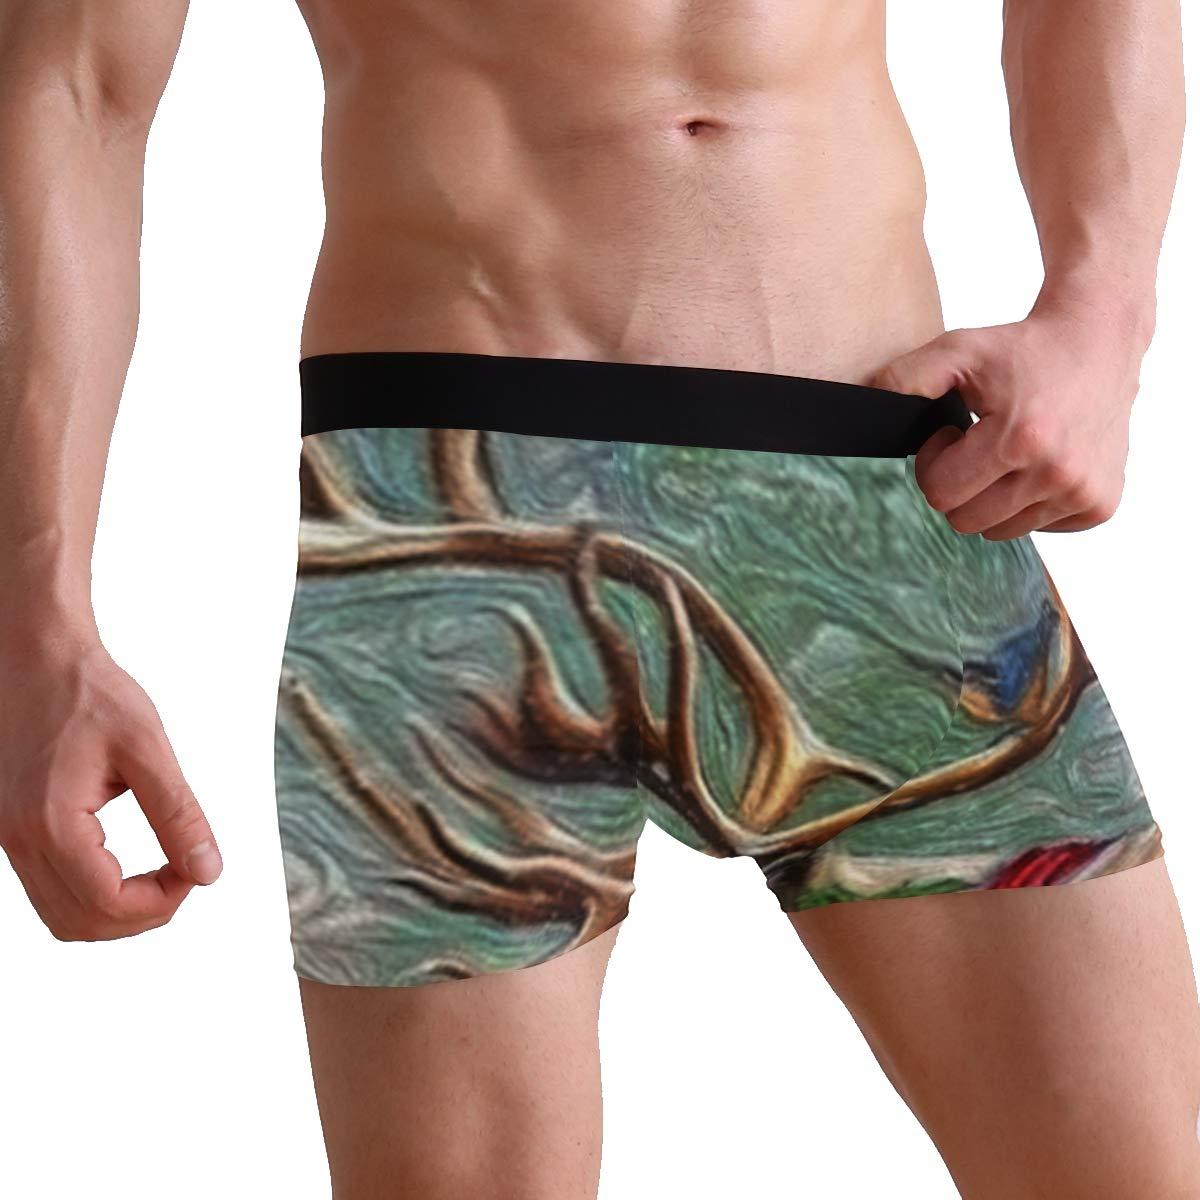 CATSDER Christmas Reindeer Boxer Briefs Mens Underwear Pack Seamless Comfort Soft